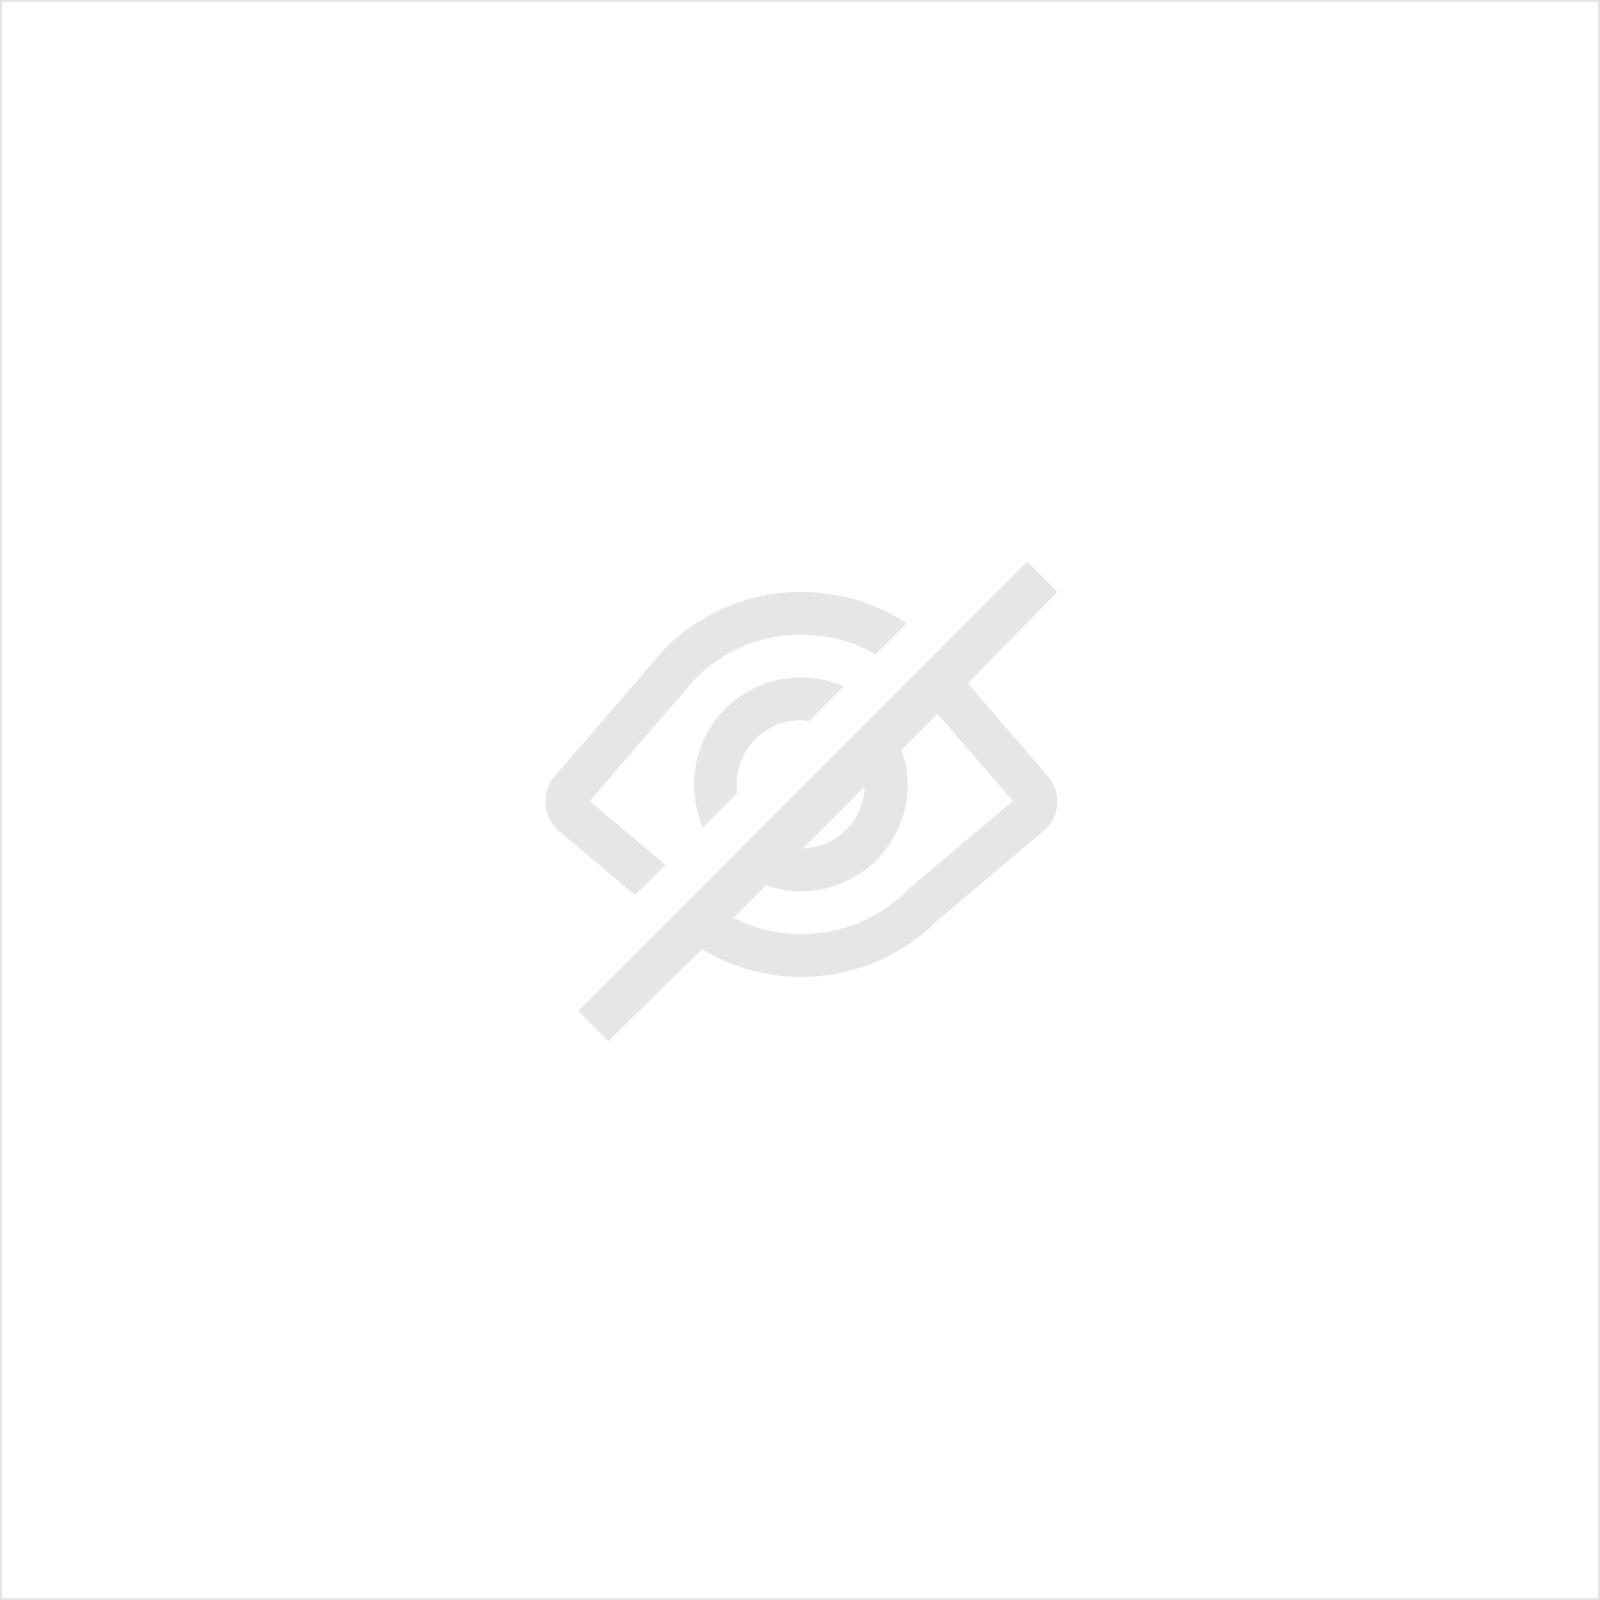 CLECO SET : MONTAGETANG + 10 BEVESTIGINGSPIN 1/8 + 2 KLEM MET BEK 1/2